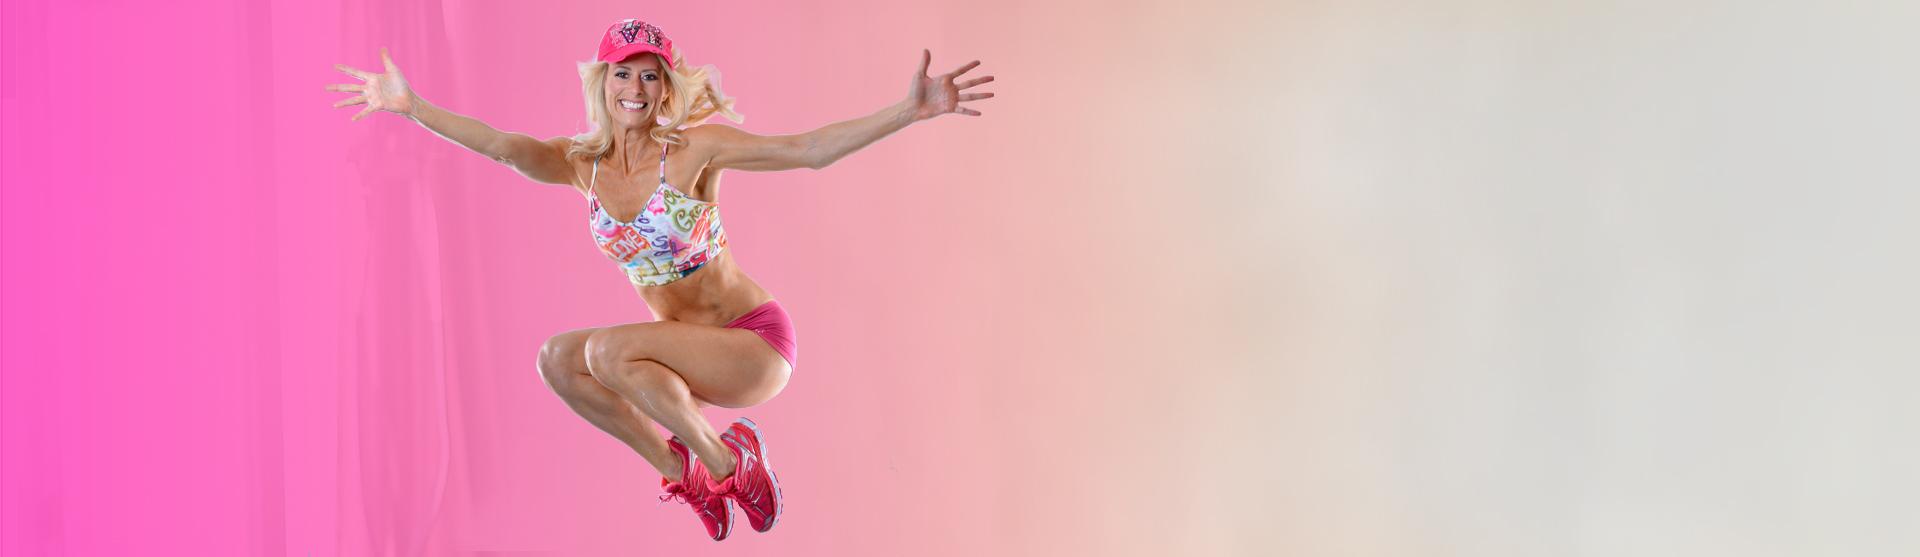 Janis Saffell Cardio based workouts | Aerobics